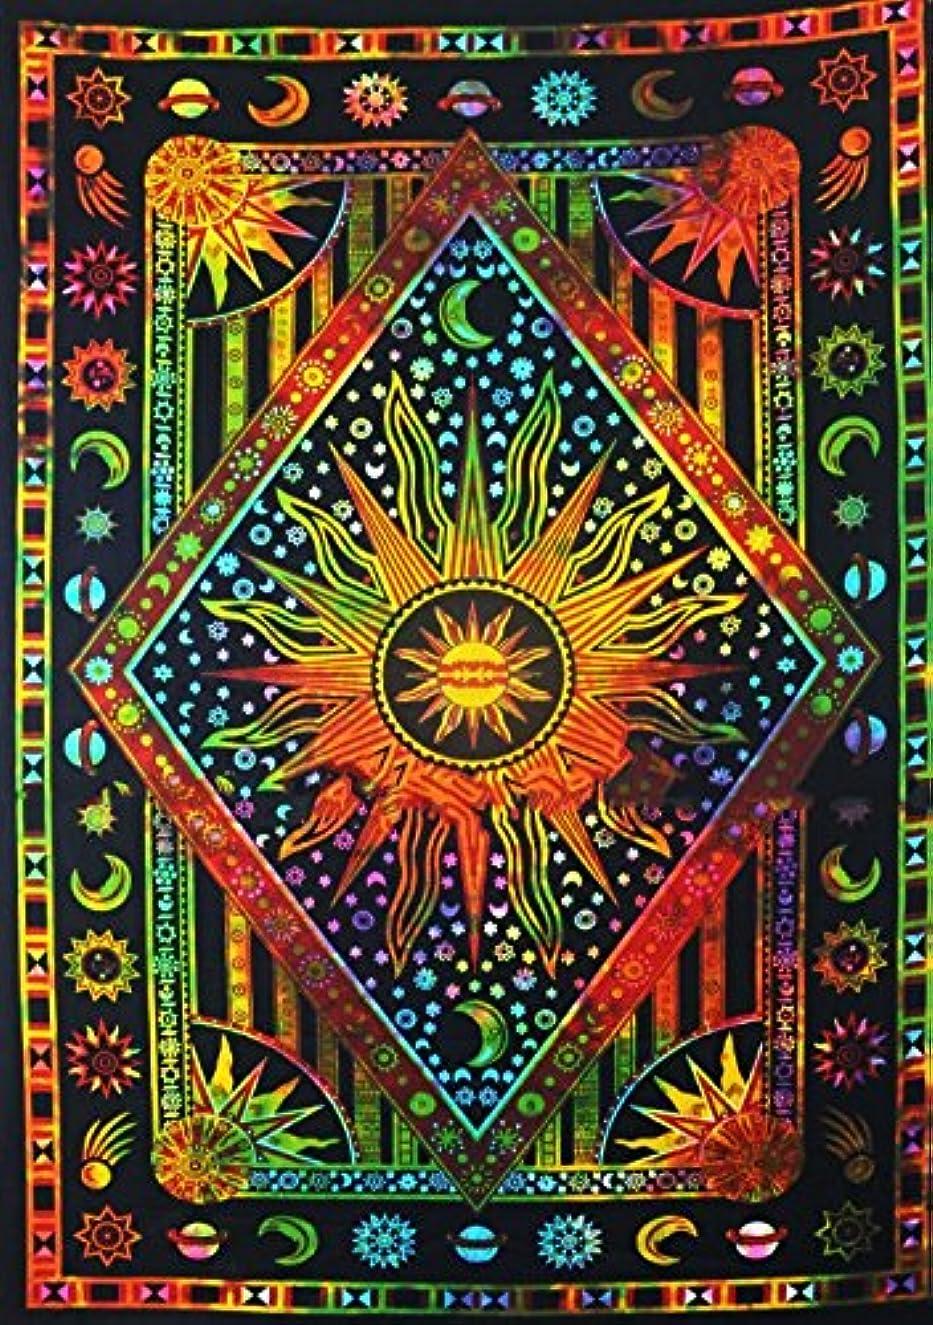 Twin Orange Tie Dye Multi Burning Sun Tapestry, Celestial Sun Moon Planet Bohemian Tapestry Tapestry Tapestry Wall Hanging Boho Tapestry Hippie Hippy Tapestry Beach Coverlet Curtain by RSG Venture